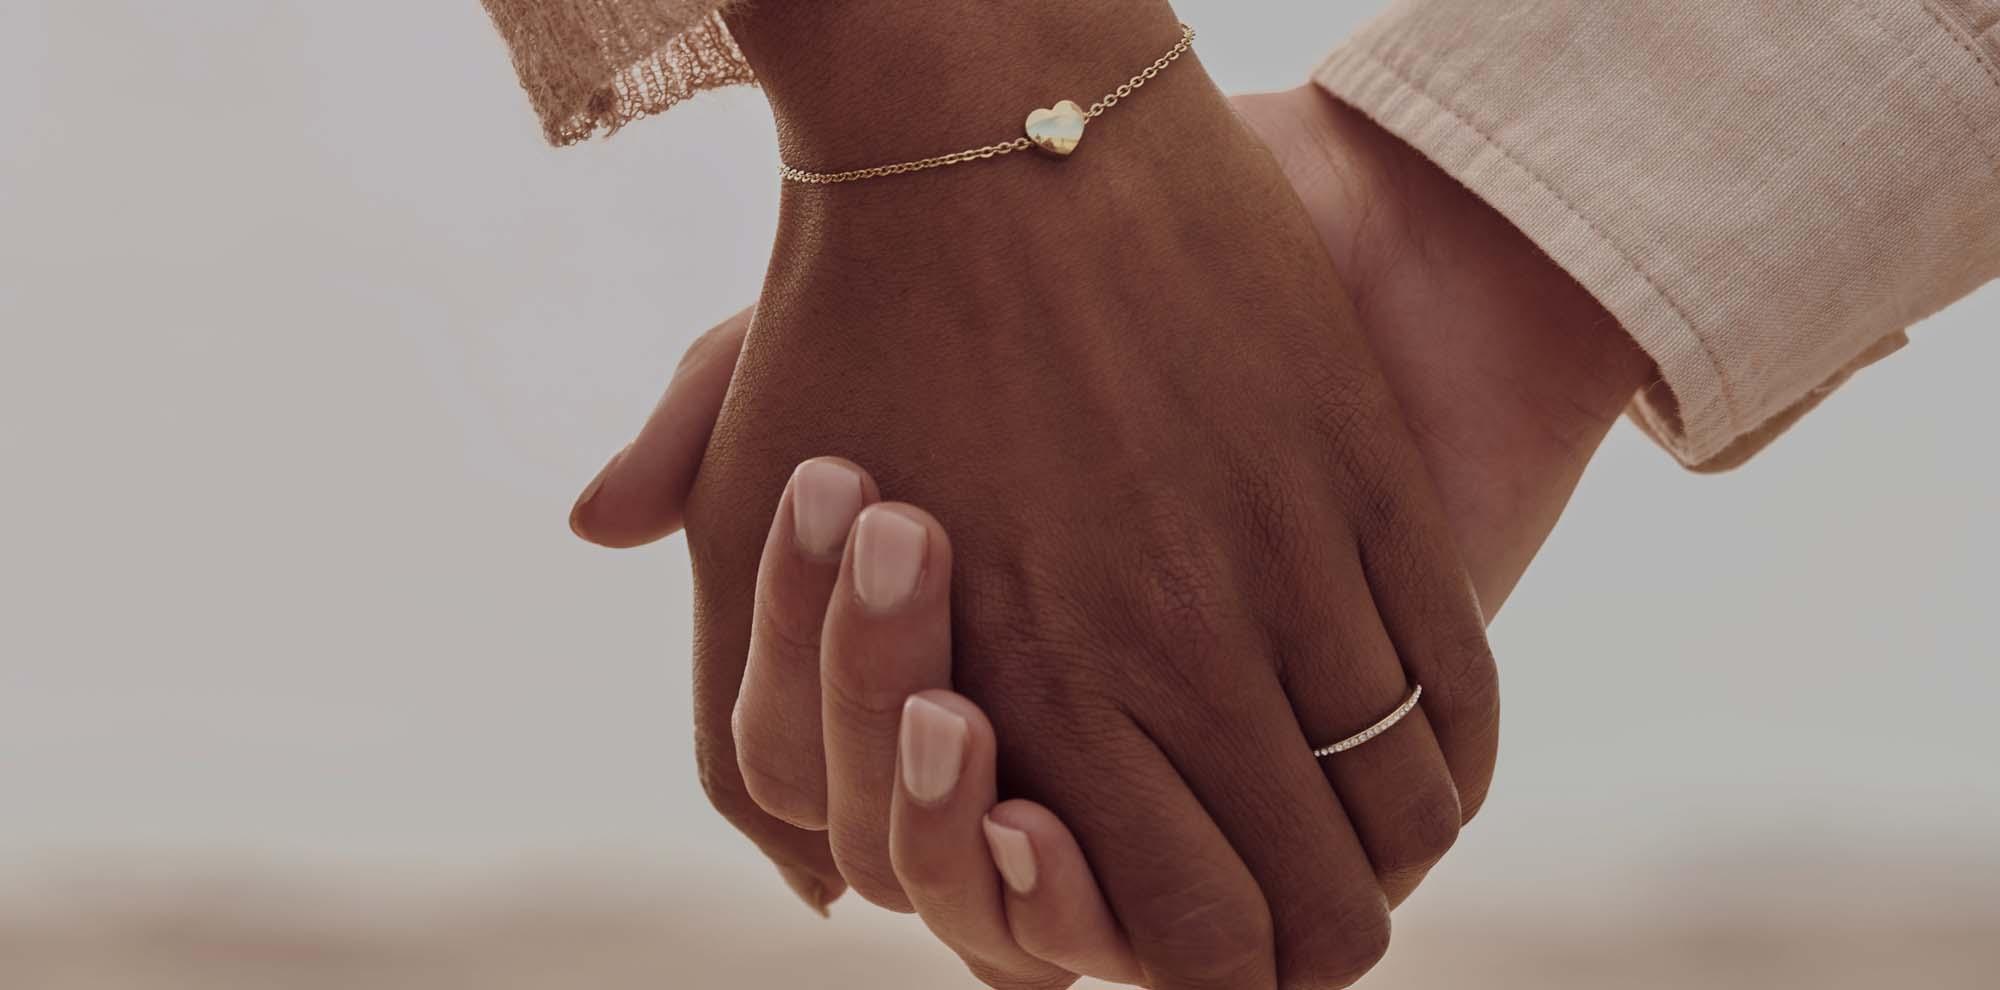 Caring jewellery